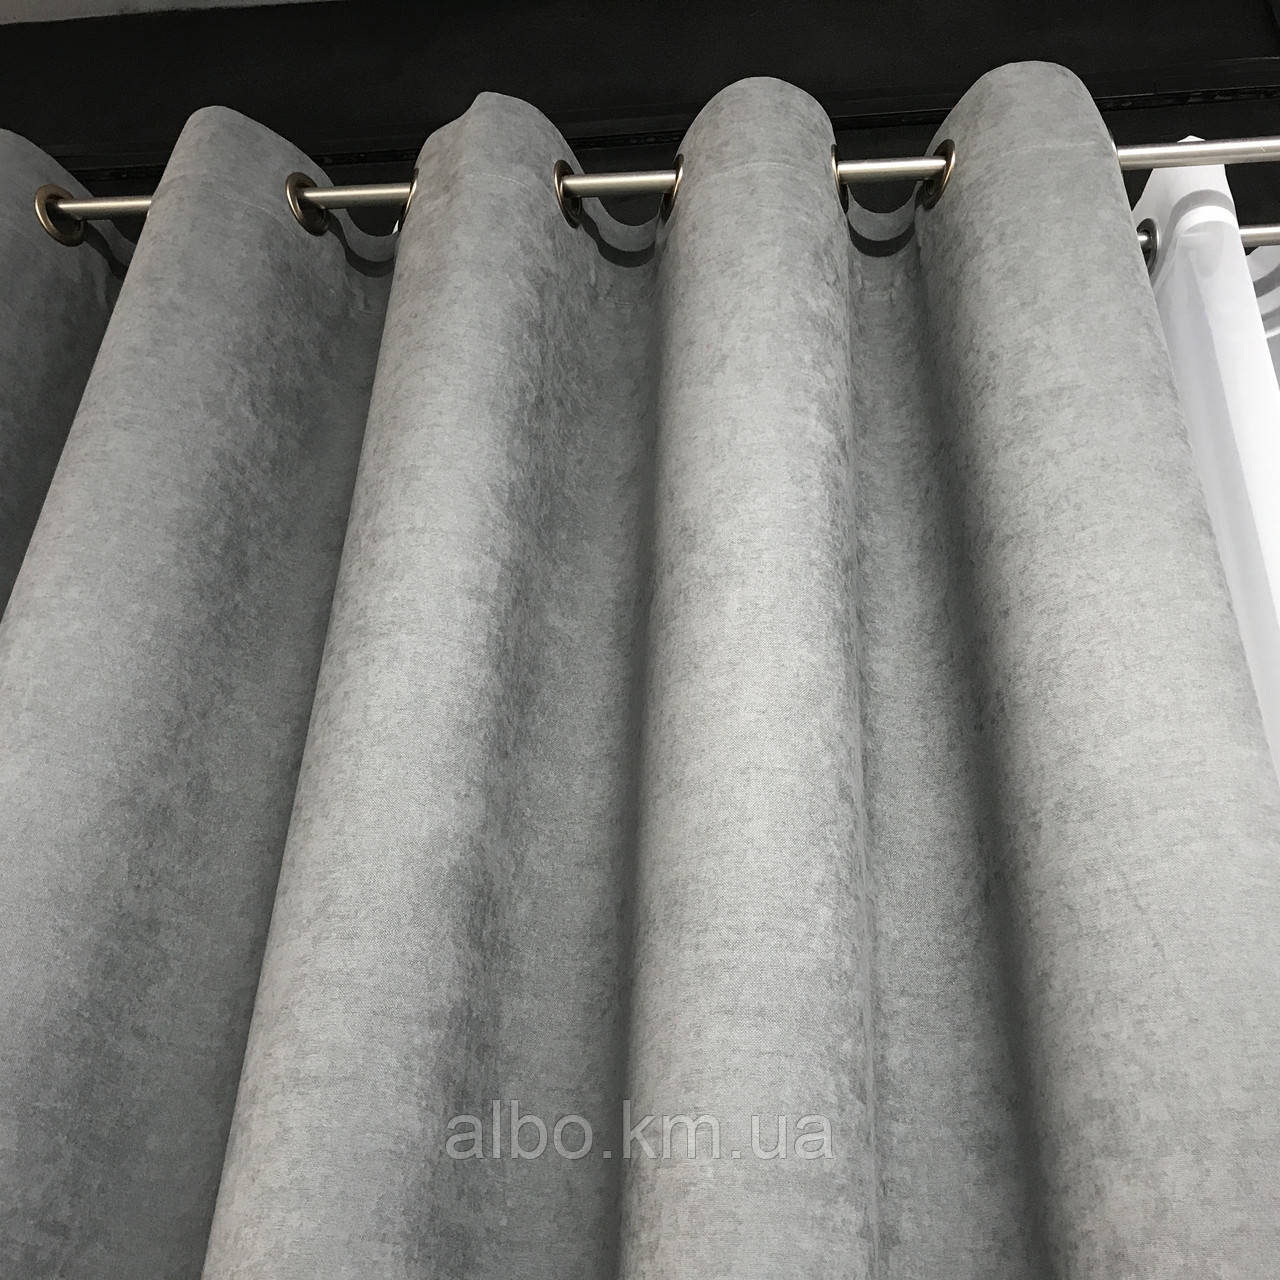 Сіра штори на люверсах мікровелюр 200x270 cm (1 шт) ALBO Сіра (SH-Petek - 339)